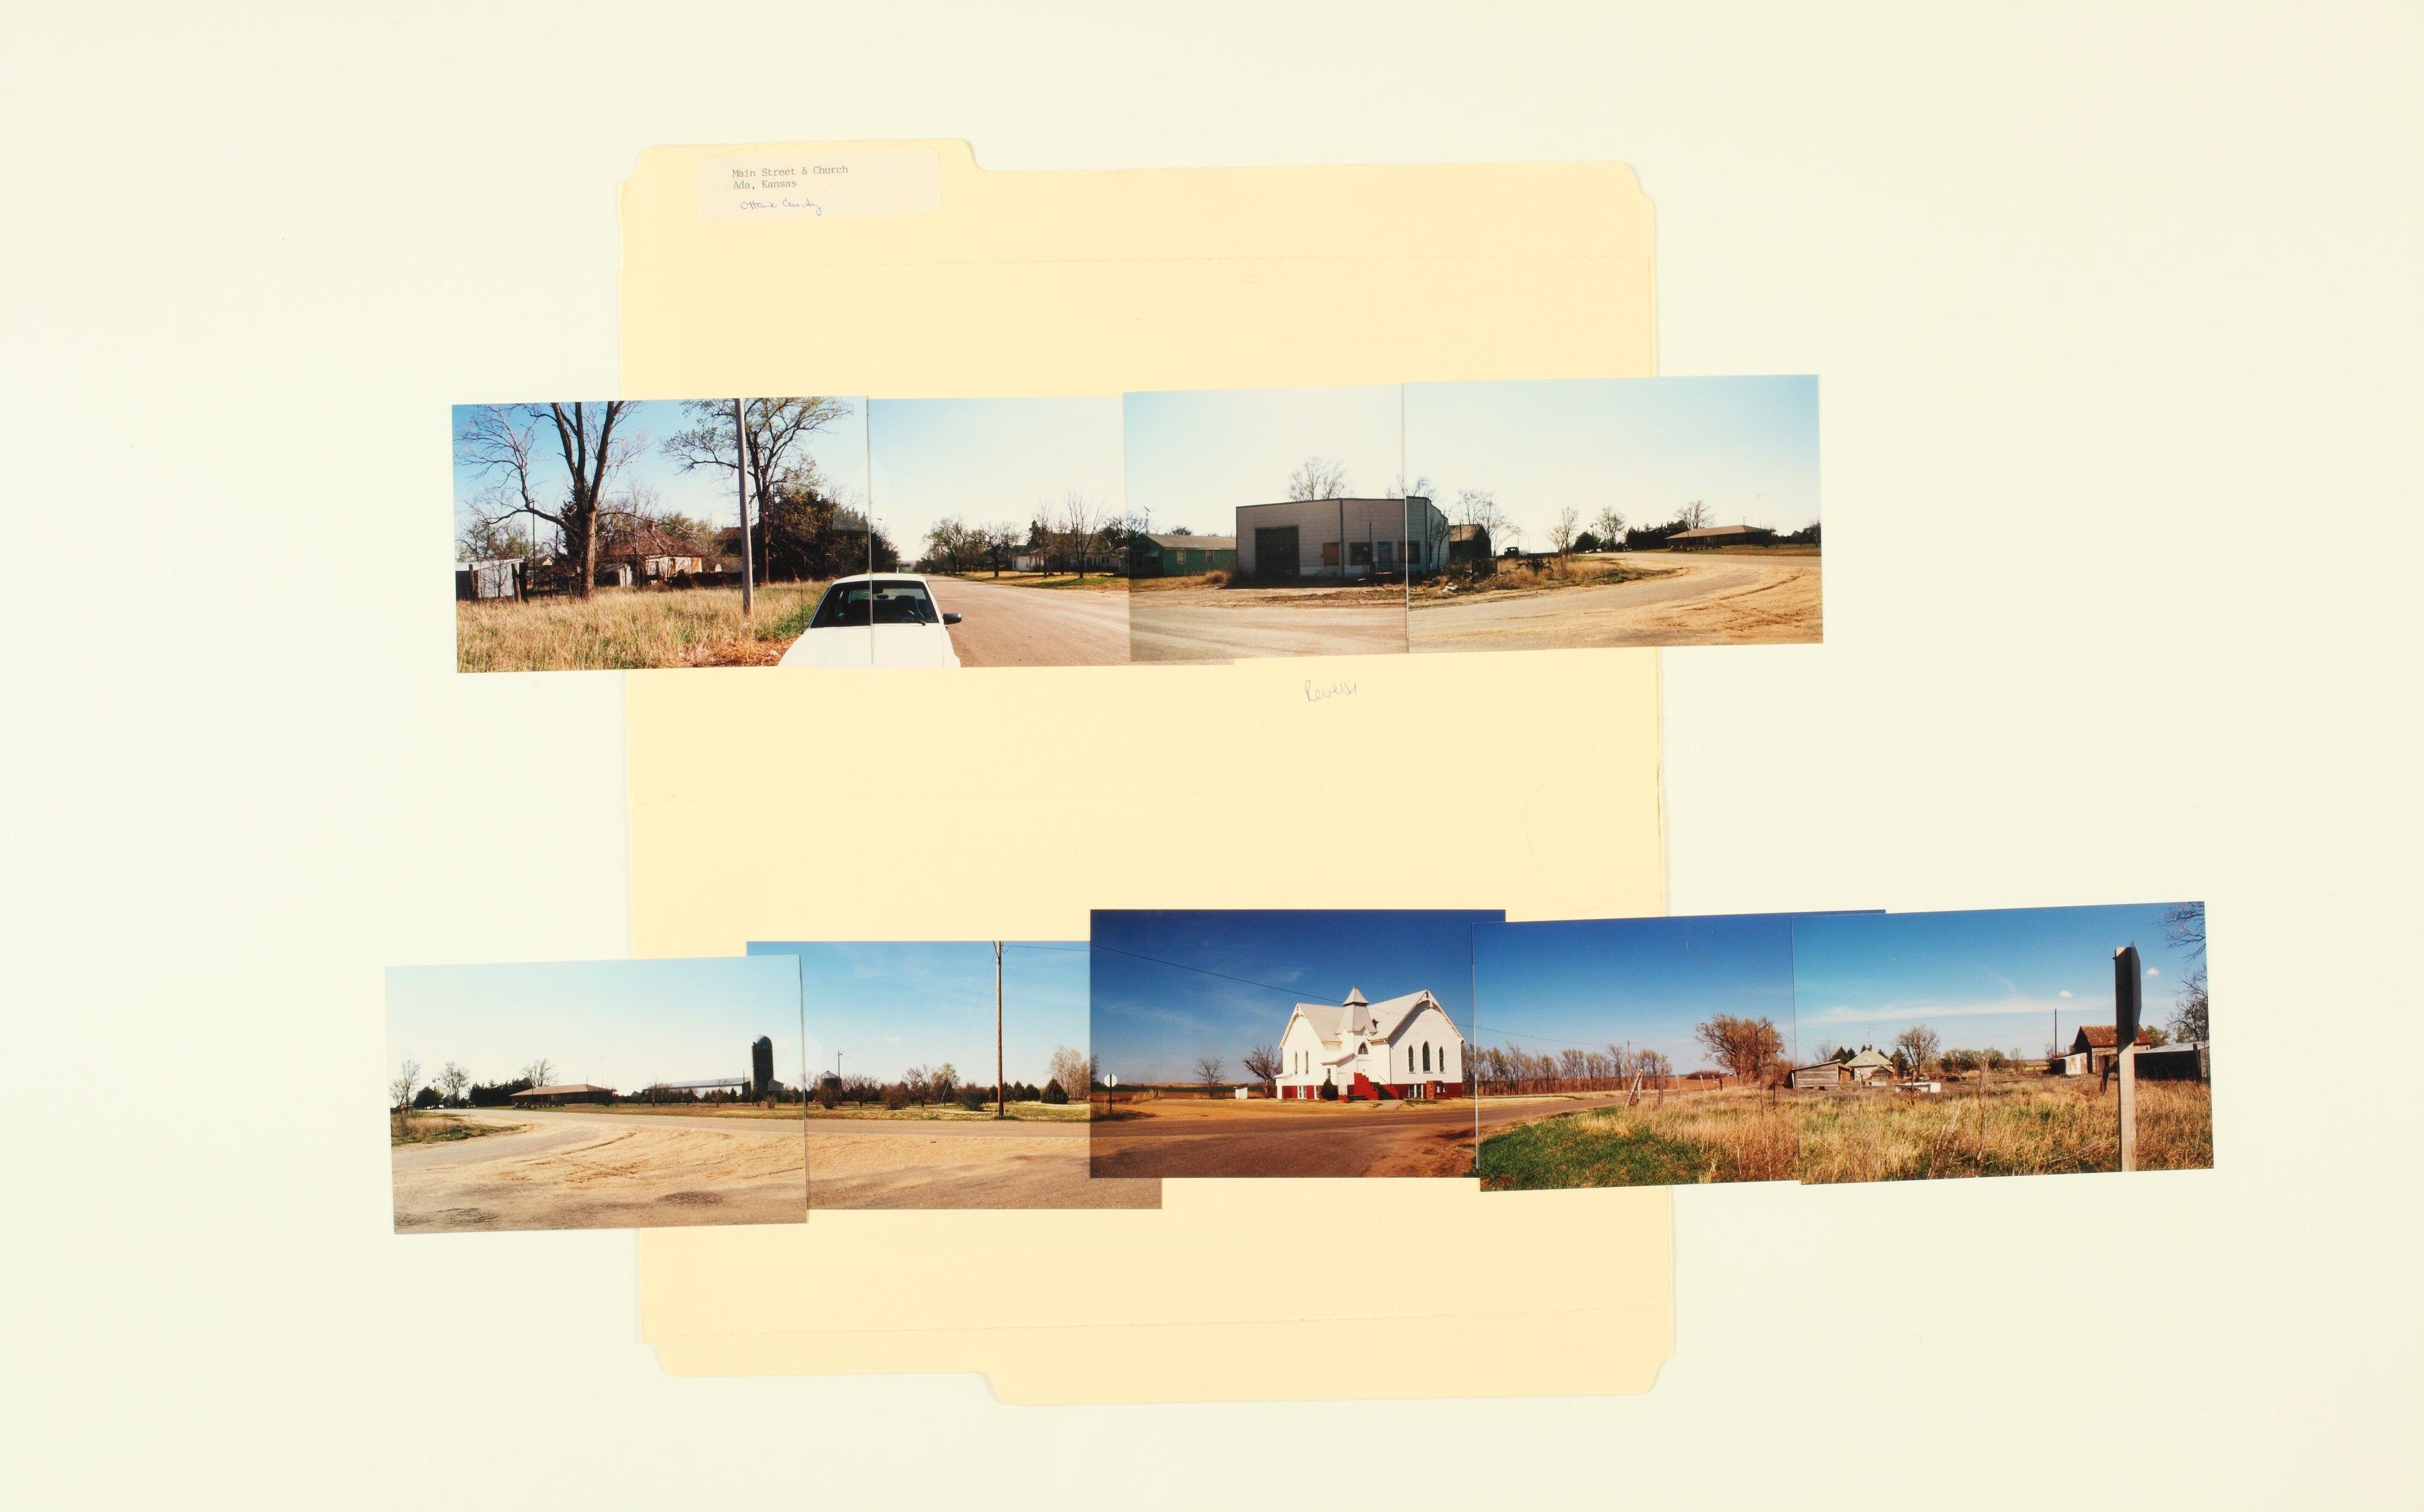 Kansas Film Commission site photographs, towns Ada - Bunker Hill - 3